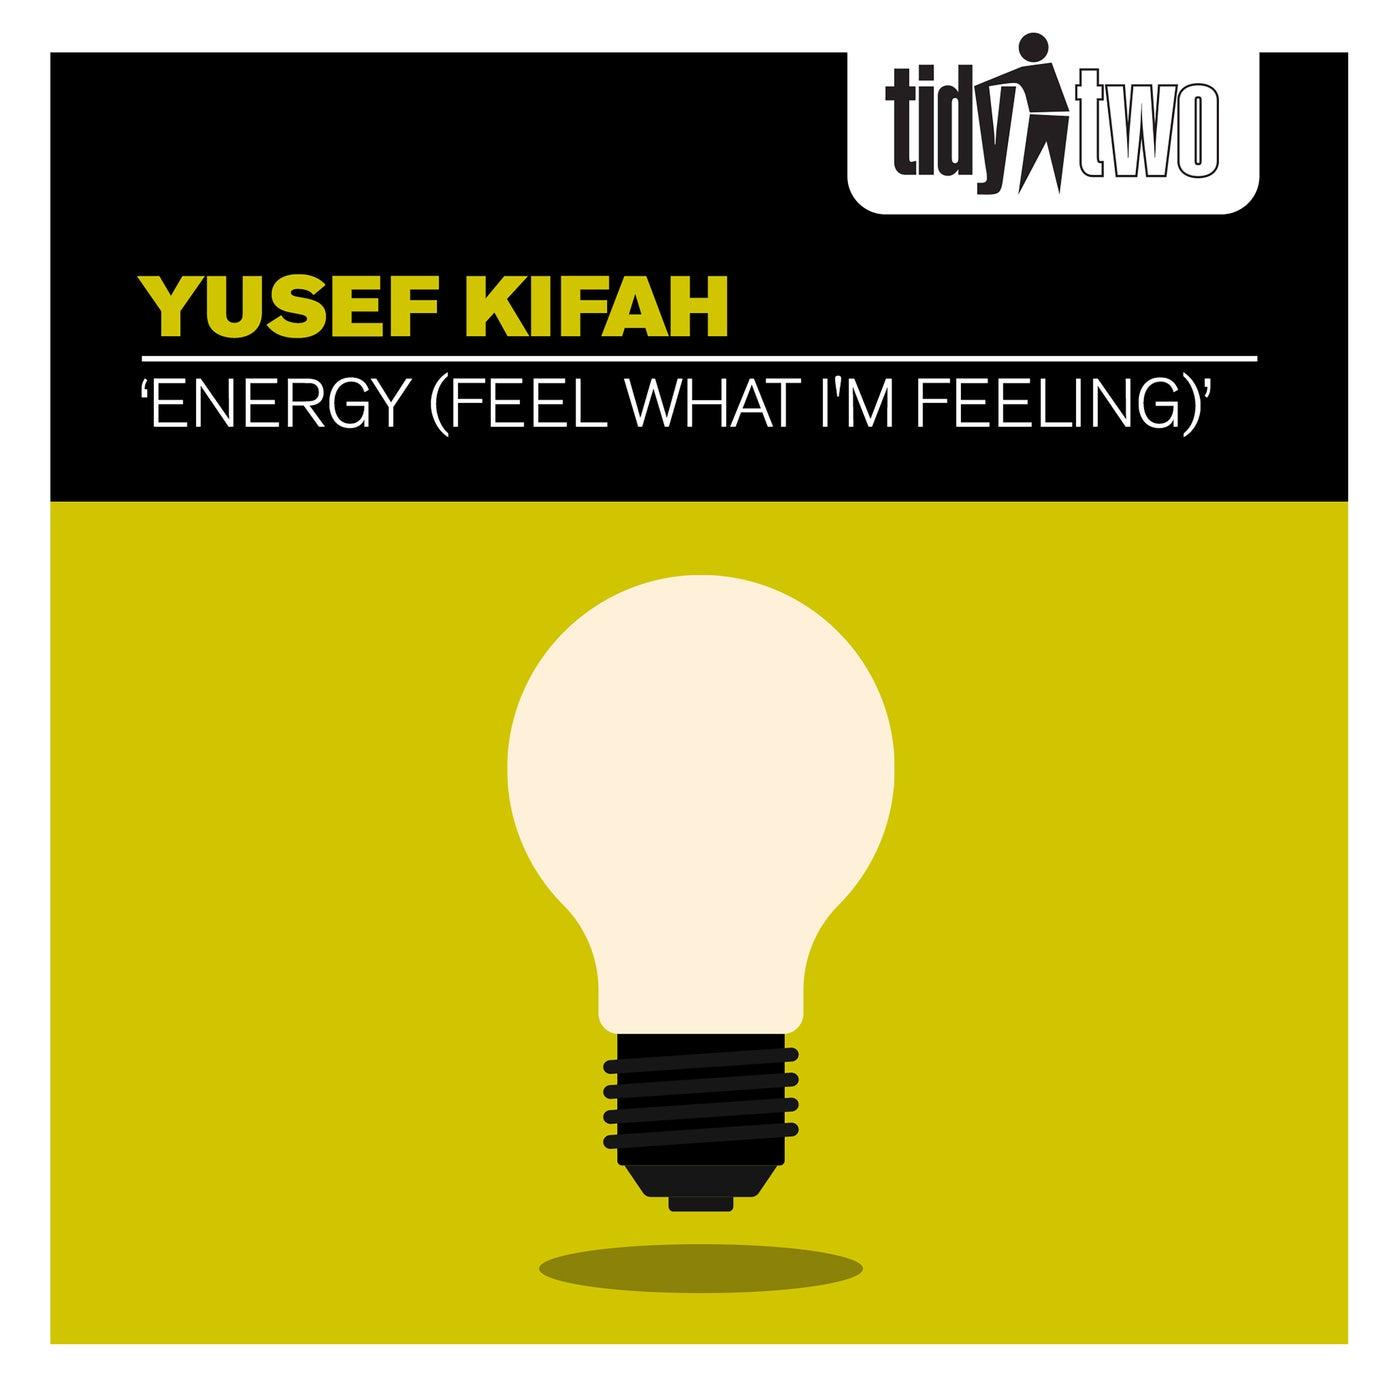 Energy (Feel What I'm Feeling) (Original Mix)